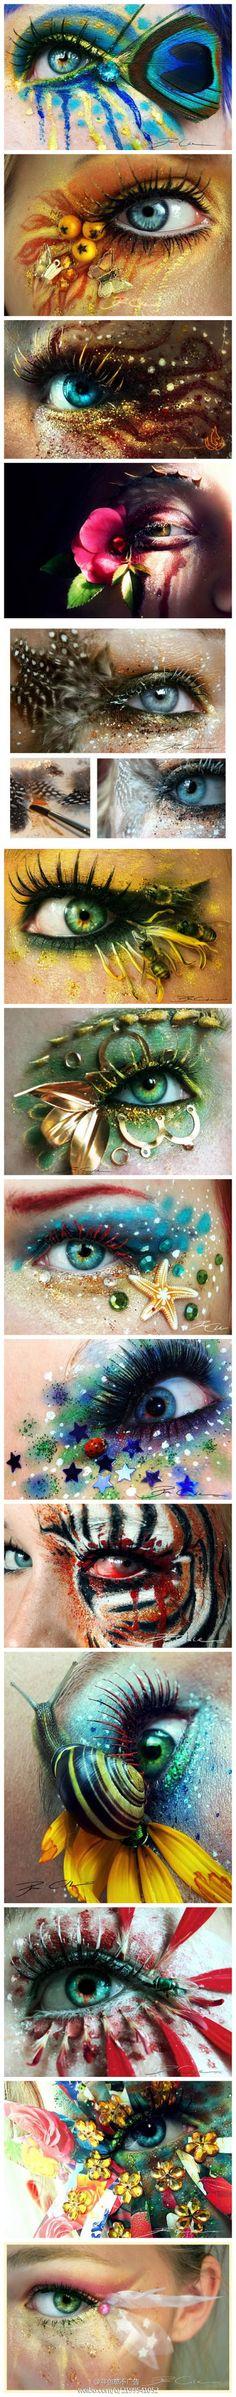 Astonishing eye make up by Svenja Jödicke